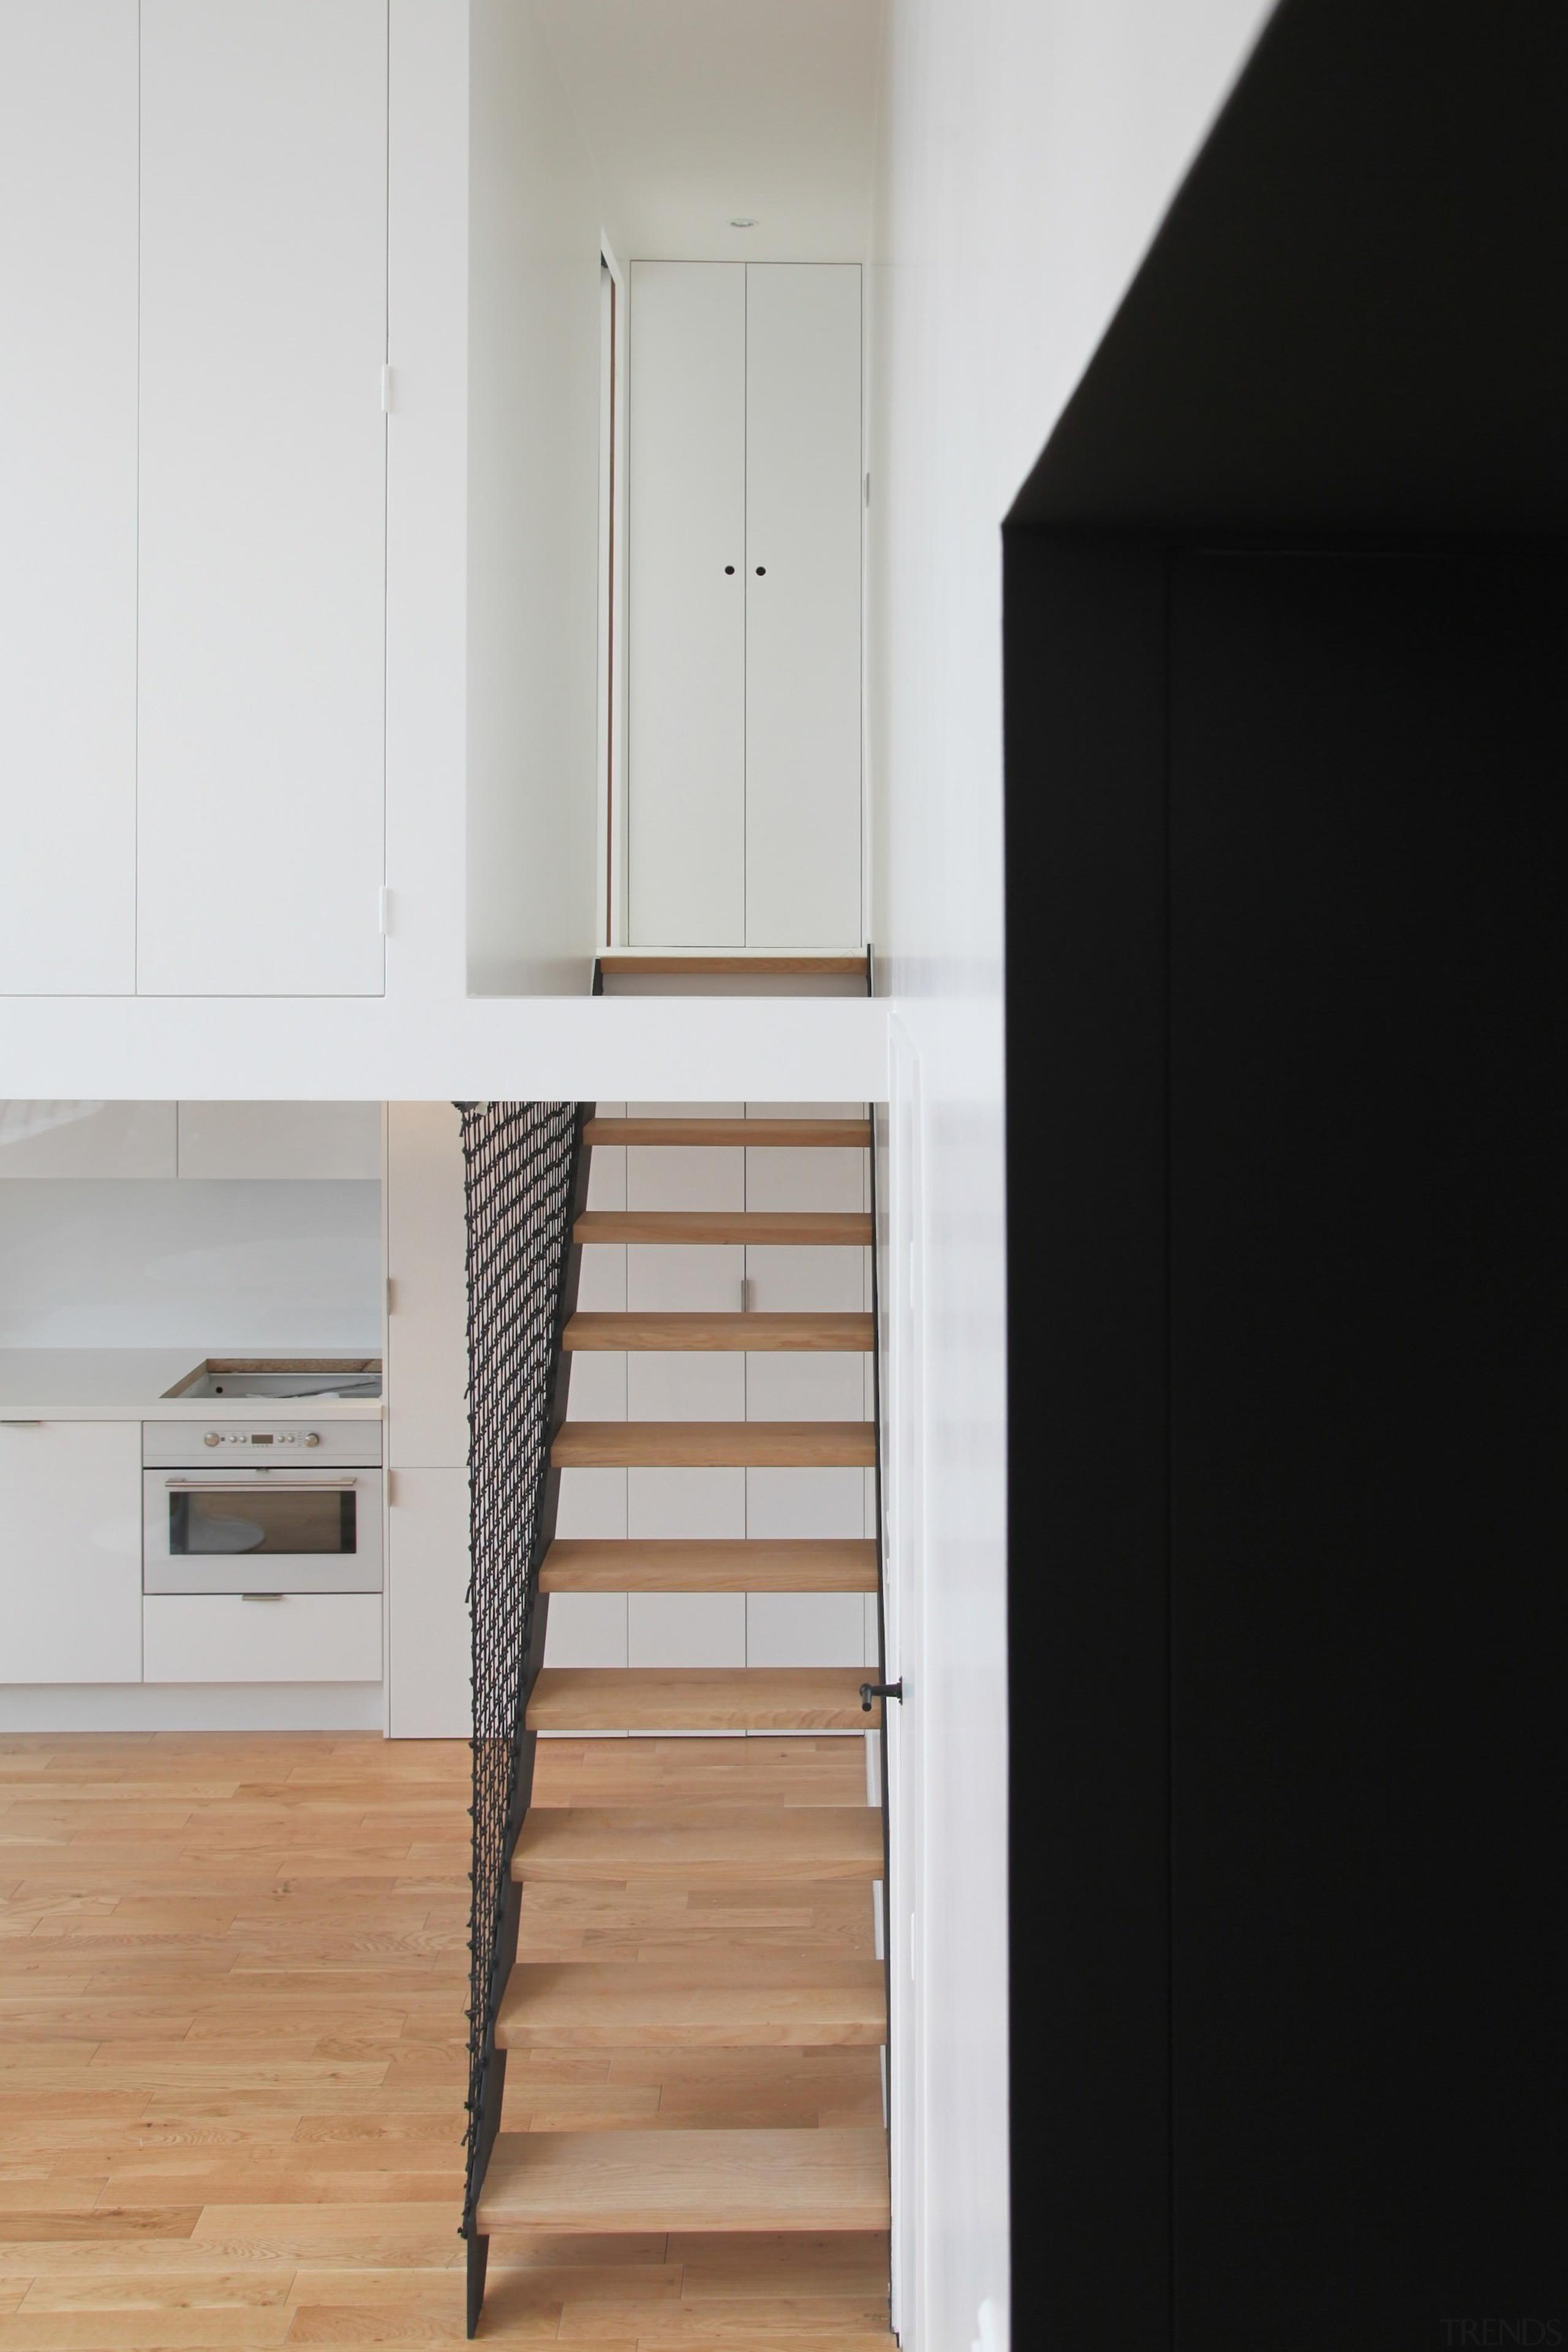 Architect: jbmn architectesPhotographer: Hermann Wendler floor, house, interior design, product design, room, wall, wood, black, gray